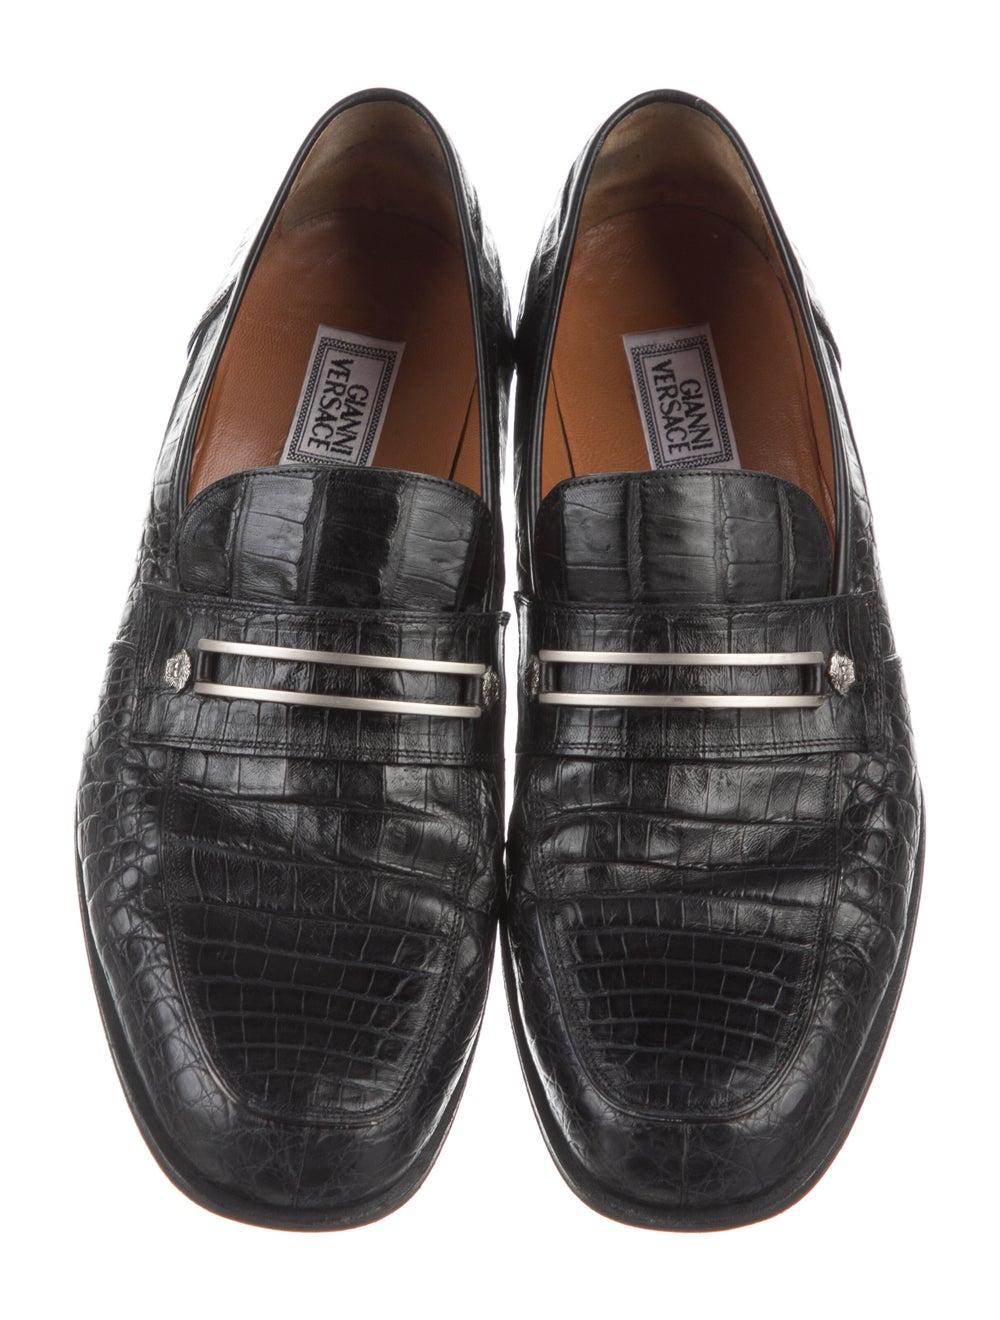 Gianni Versace Alligator Dress Loafers Black - image 3